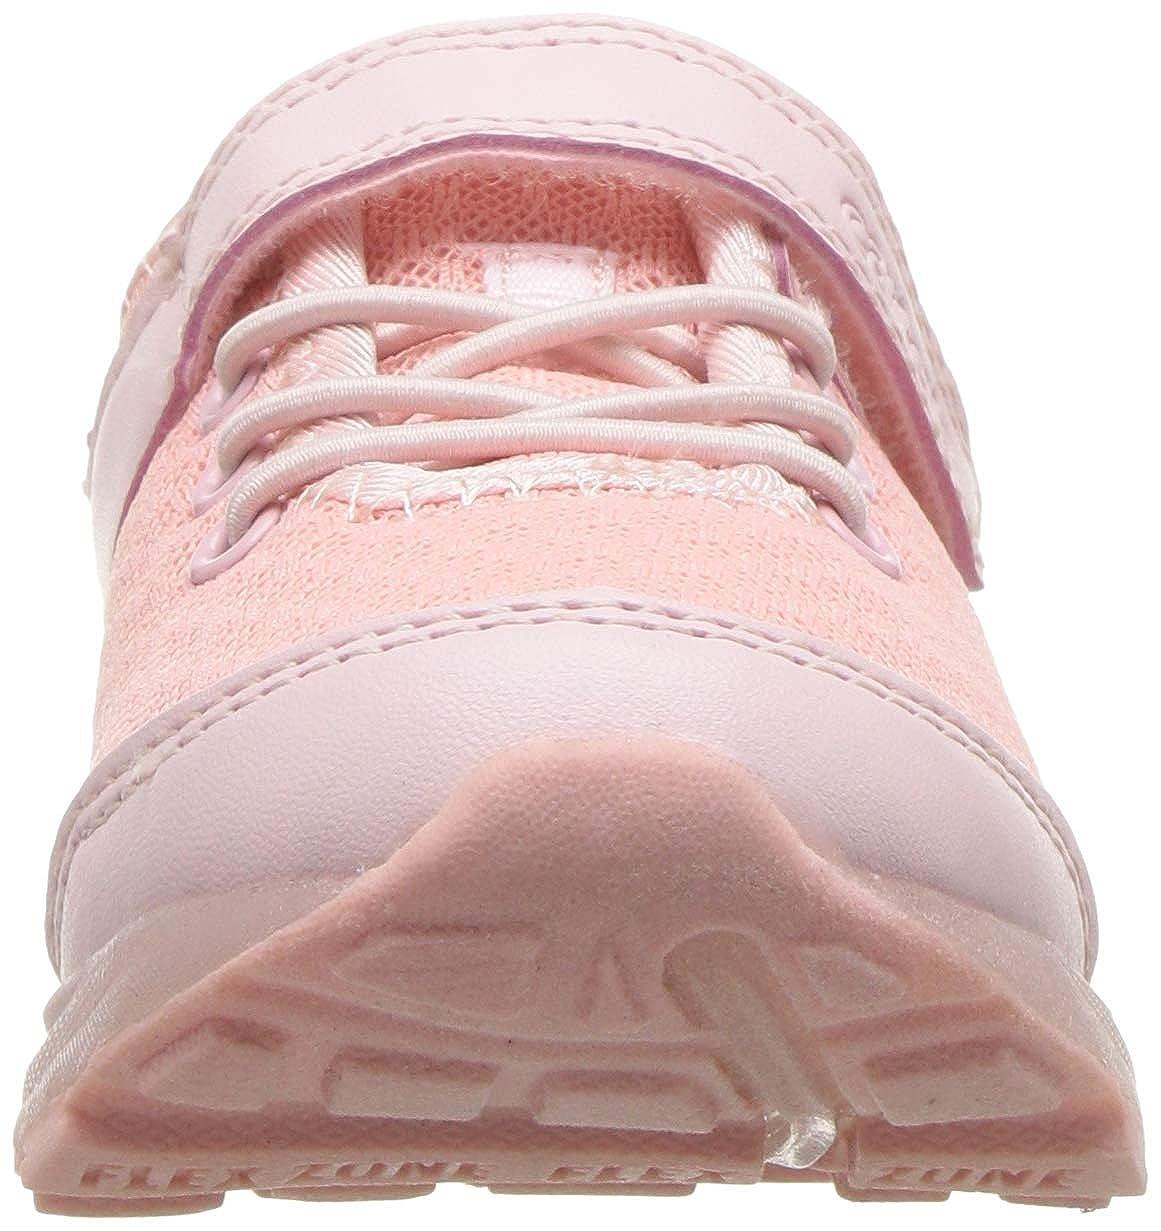 Carters Kids Daze-g Light Sneaker